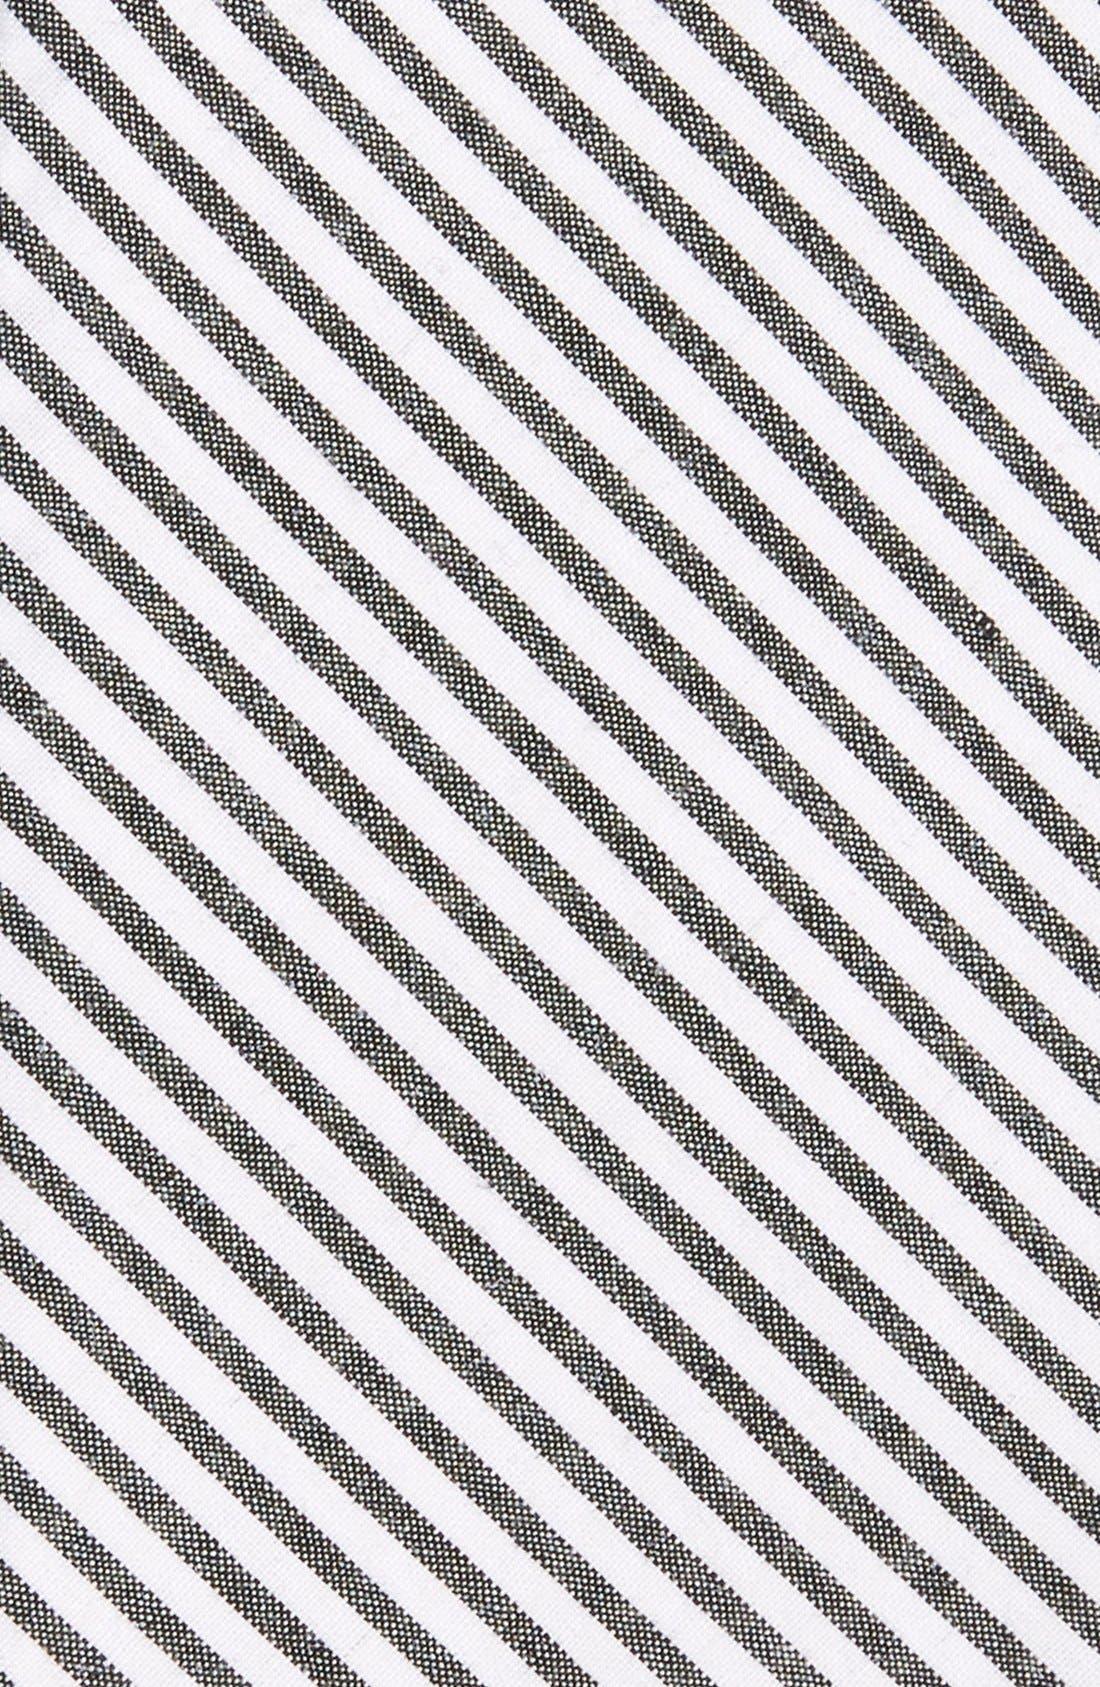 Seersucker Tie,                             Alternate thumbnail 2, color,                             006